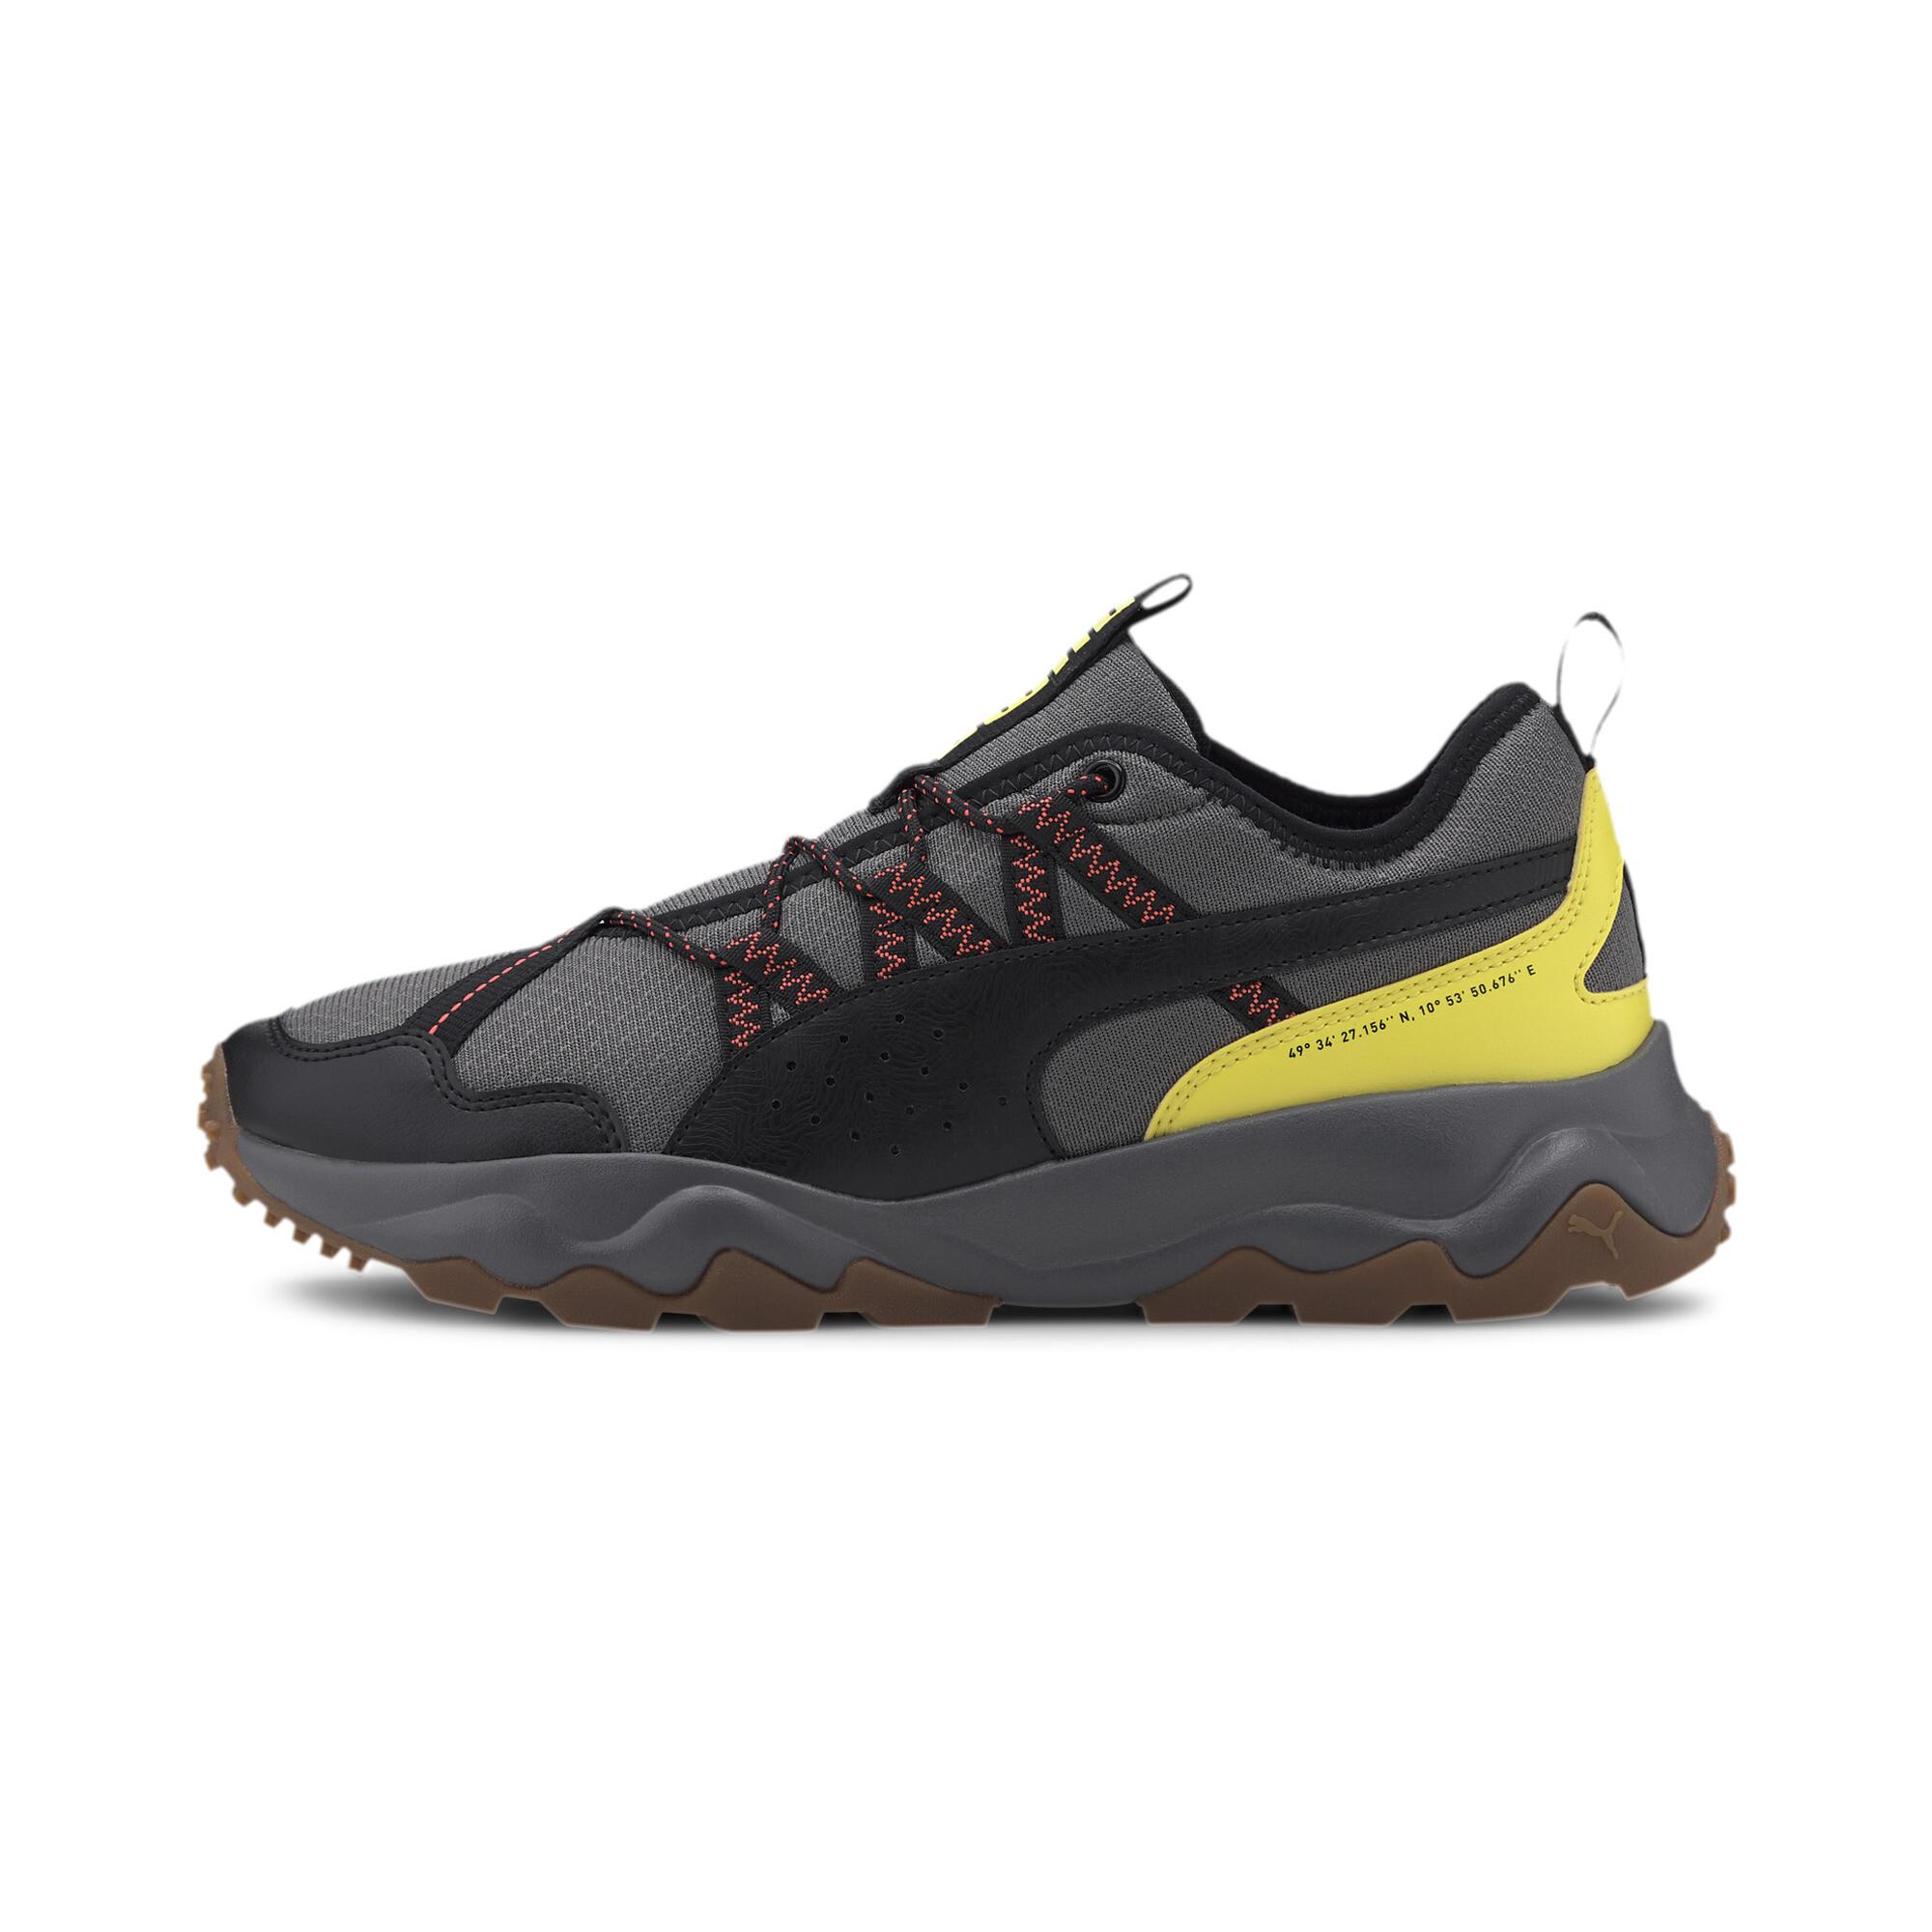 PUMA-Ember-Trail-Men-s-Running-Shoes-Men-Shoe-Running thumbnail 12